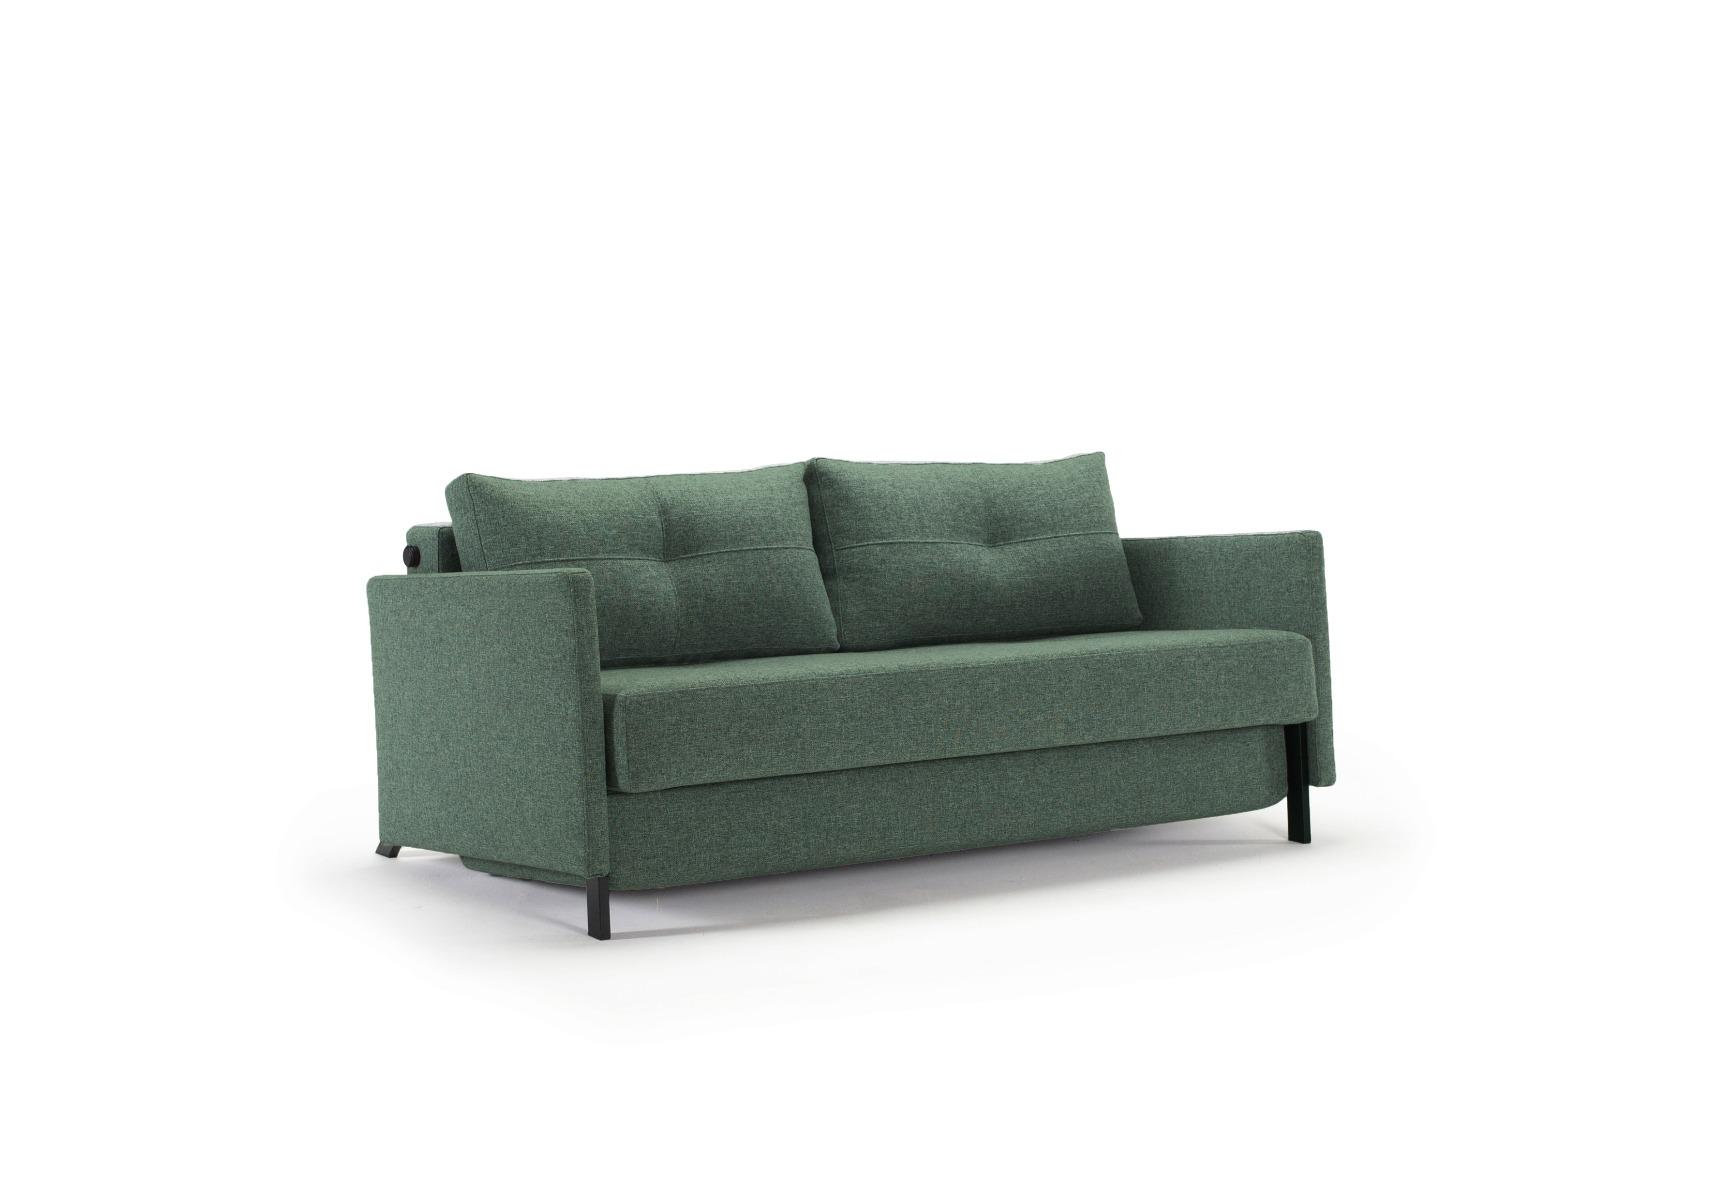 Cubed 140 Plus - Elegance Green